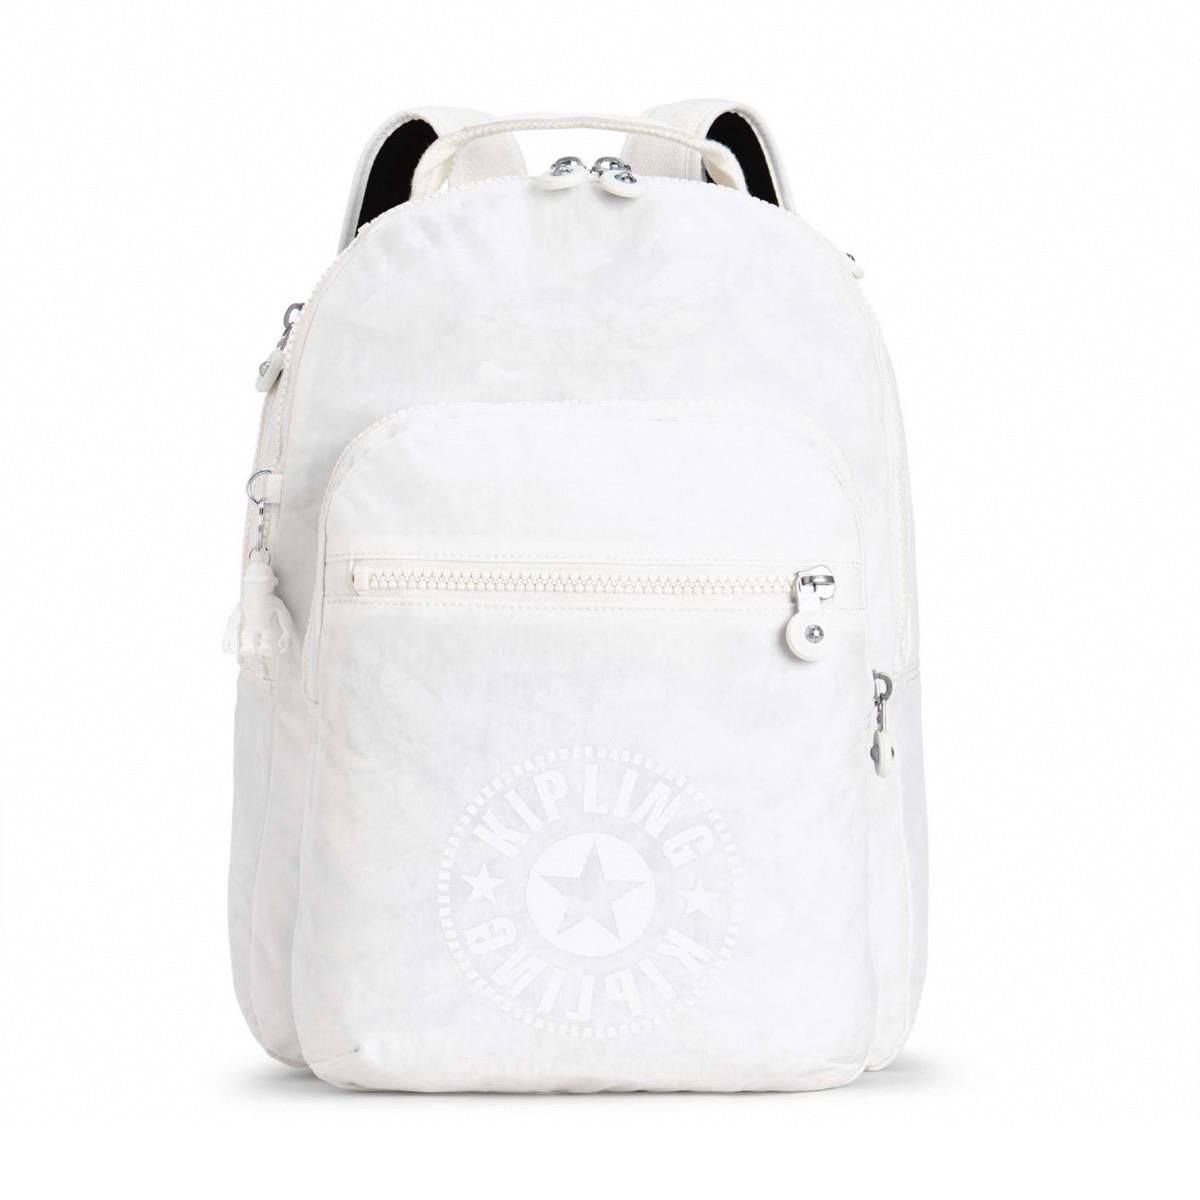 56cfb1b90 Kipling Clas Seoul Backpack - Getmethatbag.co.uk Lively White